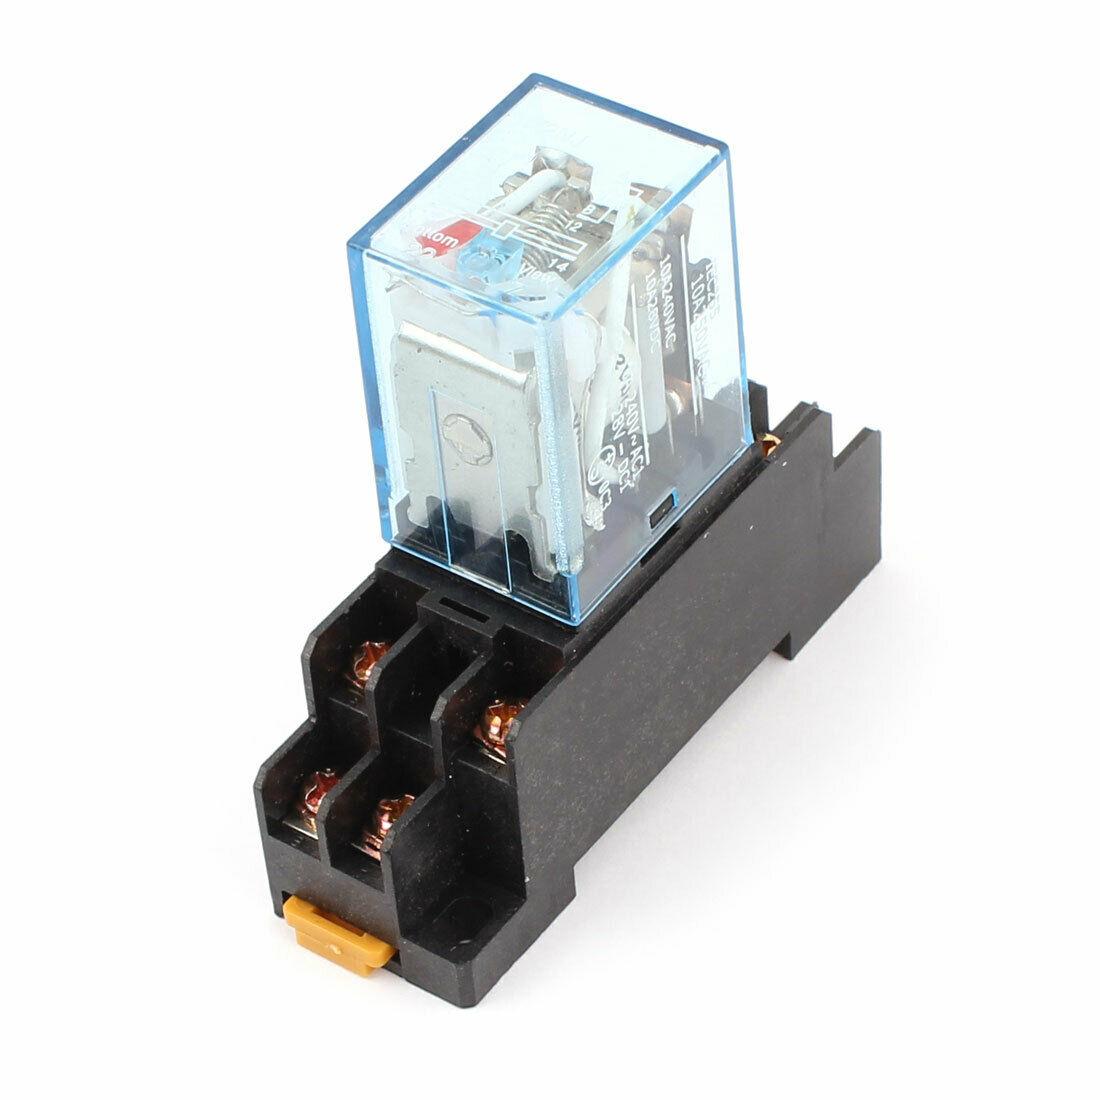 Relé de potencia de bobina cc 12V 10A DPDT ly2nd con Base de enchufe PTF08A